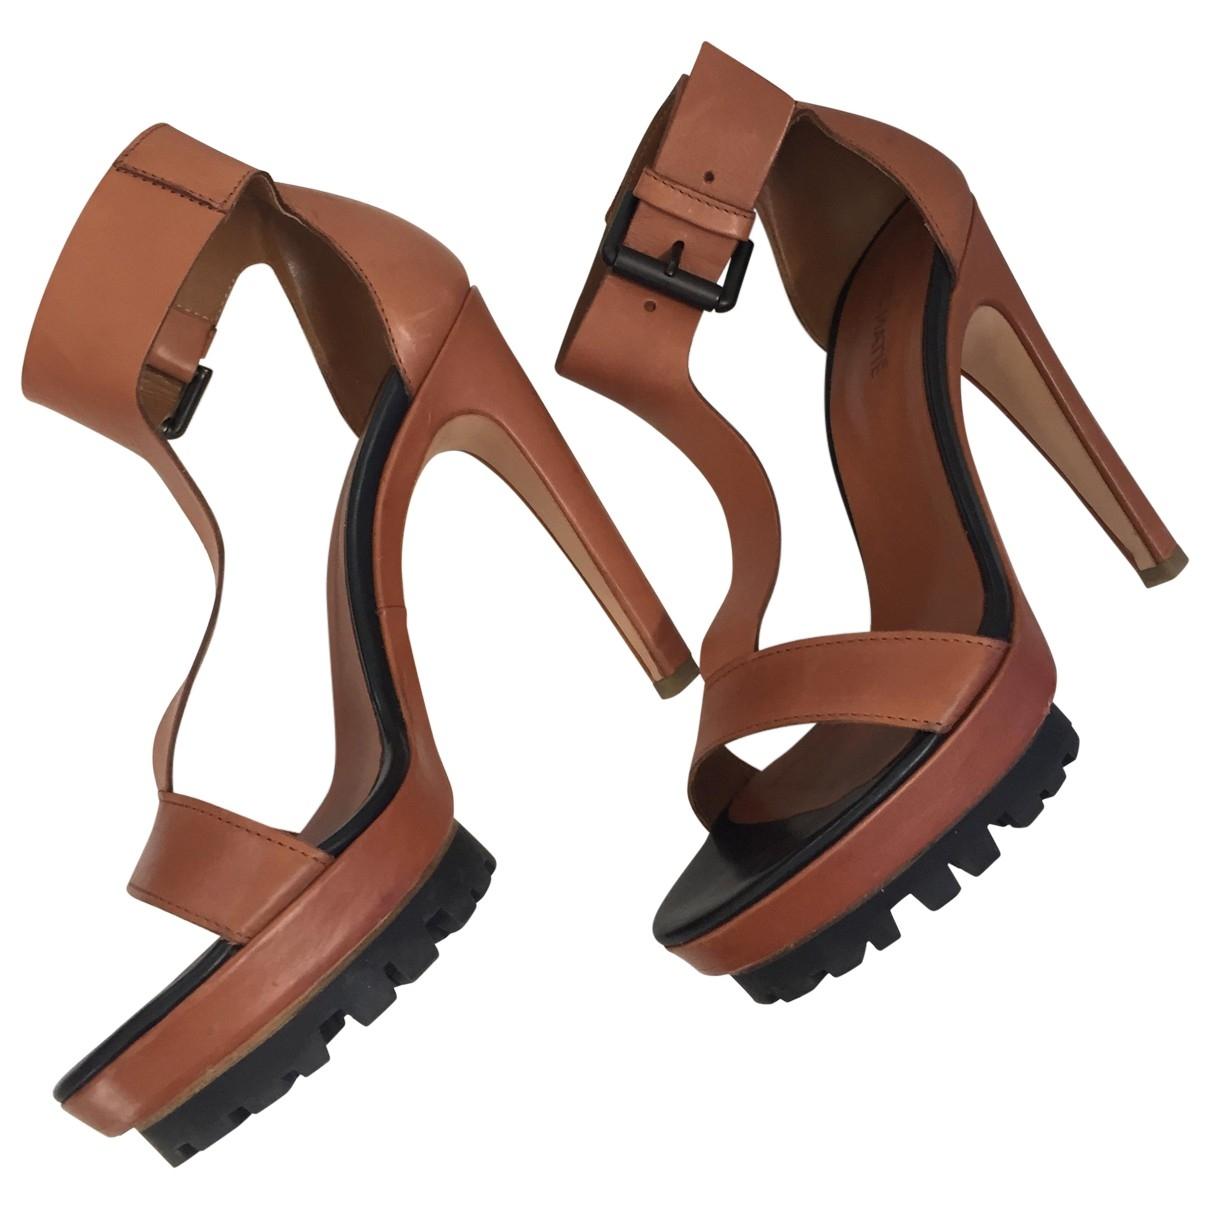 Sandalias romanas de Cuero Vic Matie